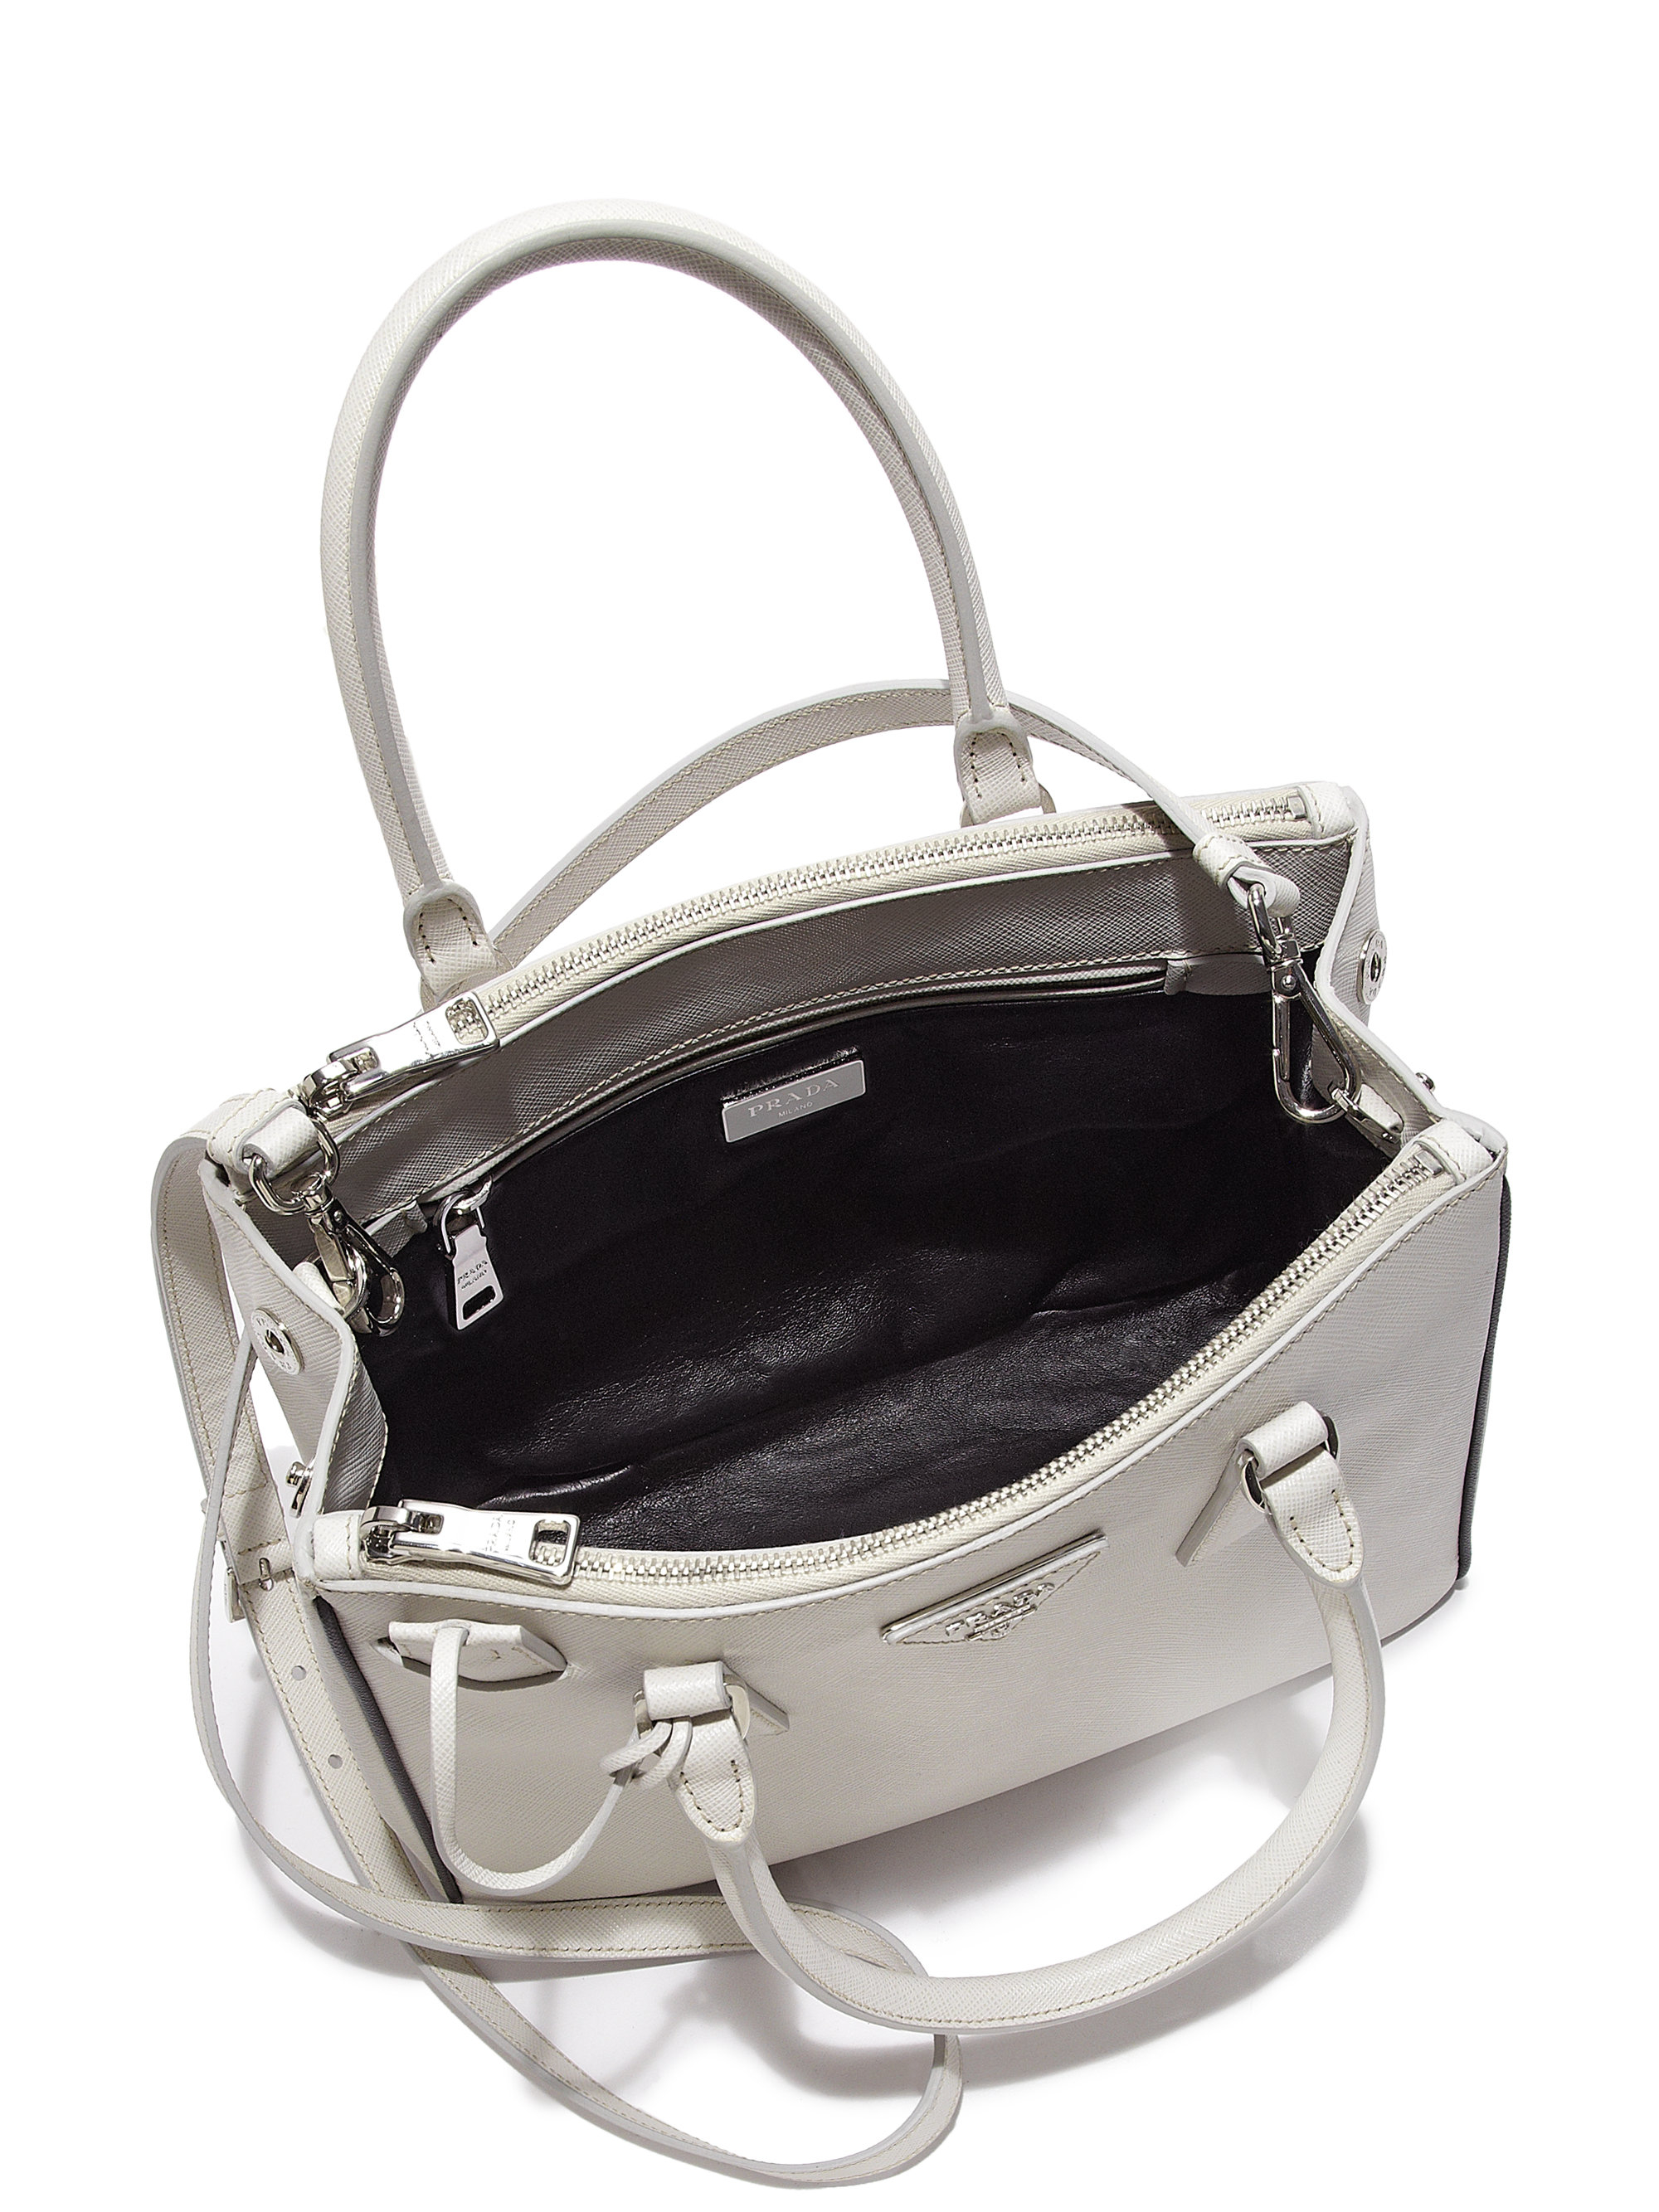 prada small double-handle nylon tote bag